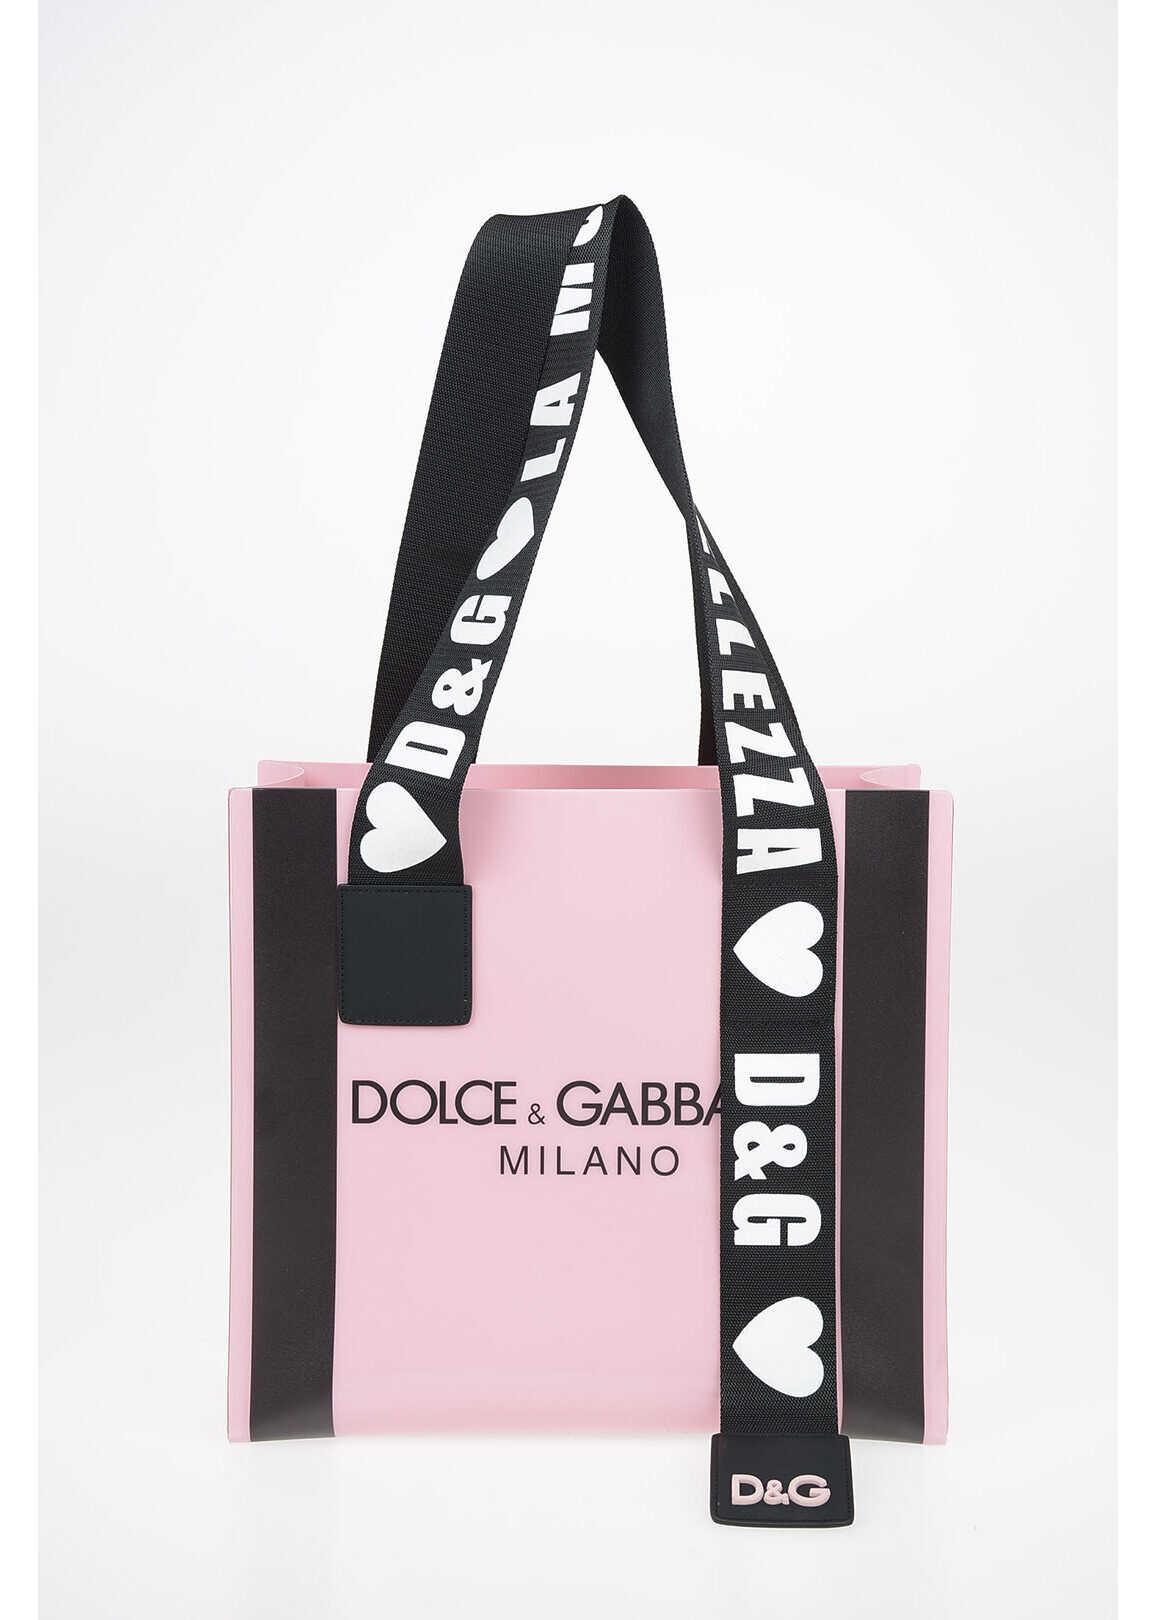 Dolce & Gabbana PVC Tote bag PINK imagine b-mall.ro